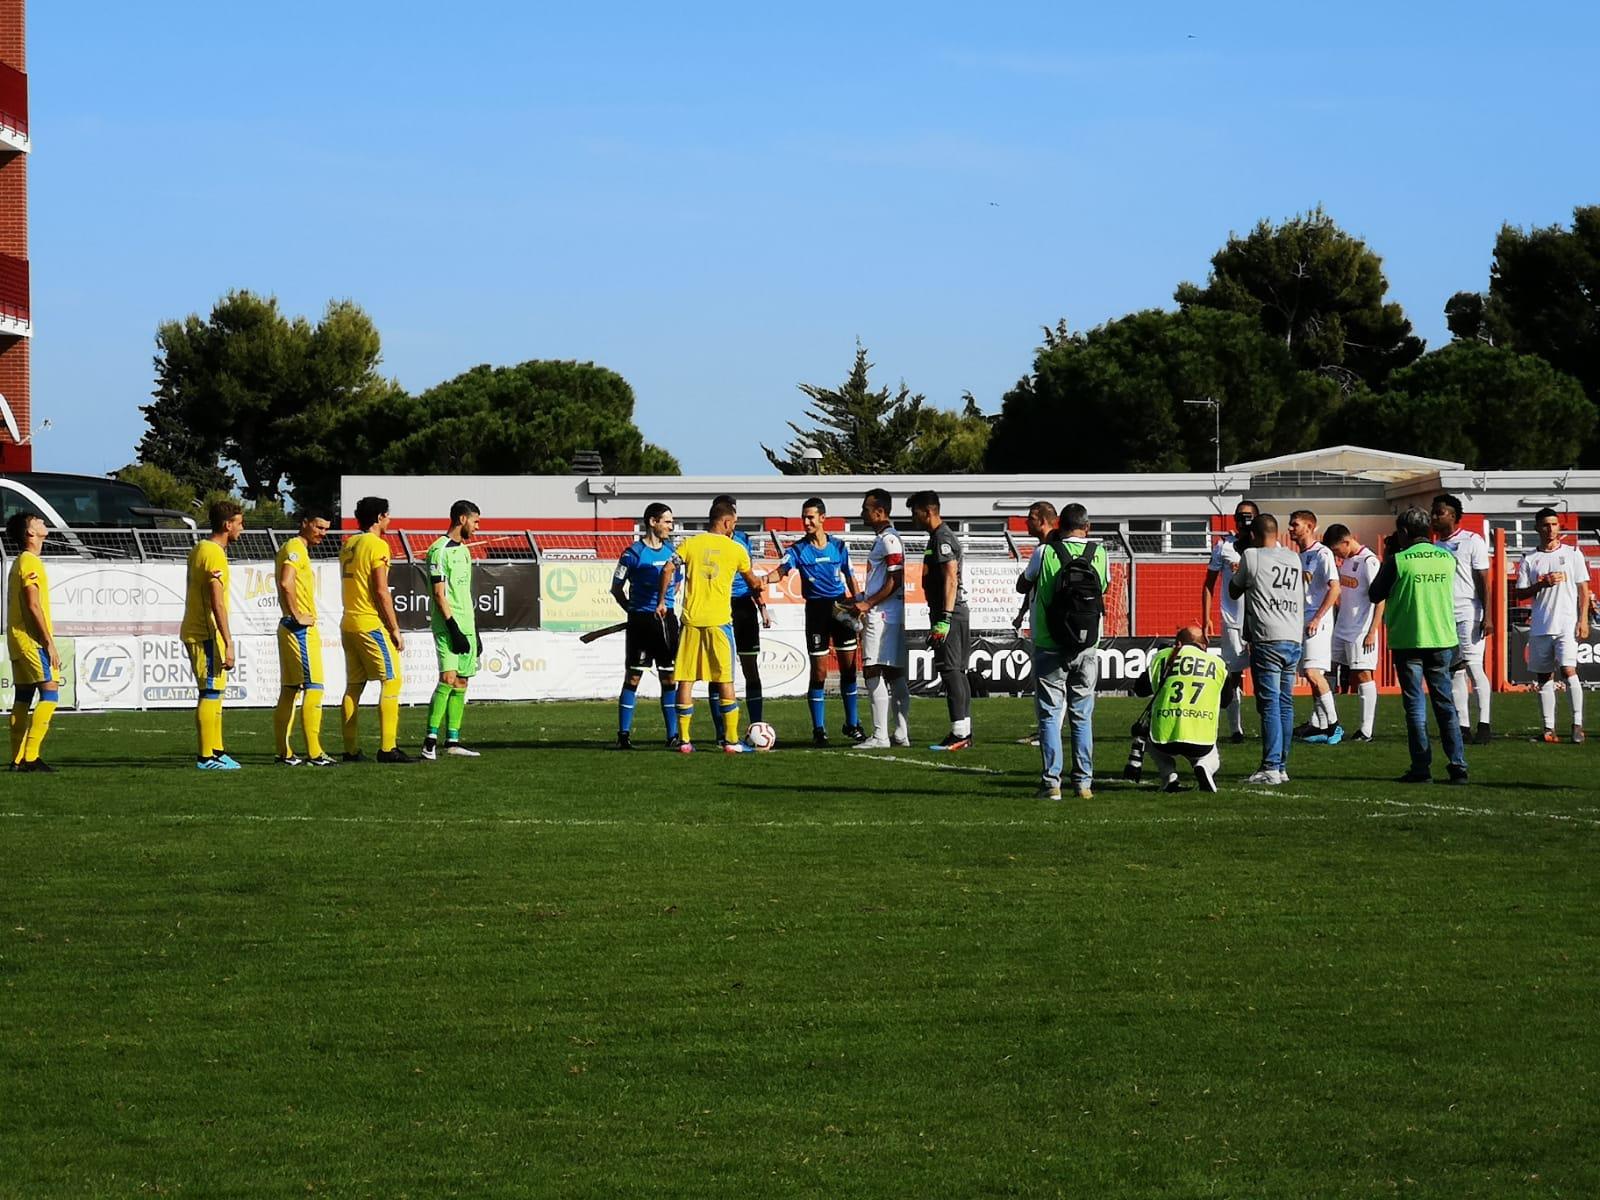 Serie D, girone F: Vastese -Vastogirardi 2-3. Impresa degli altomolisani. Kyeremateng ancora in rete.